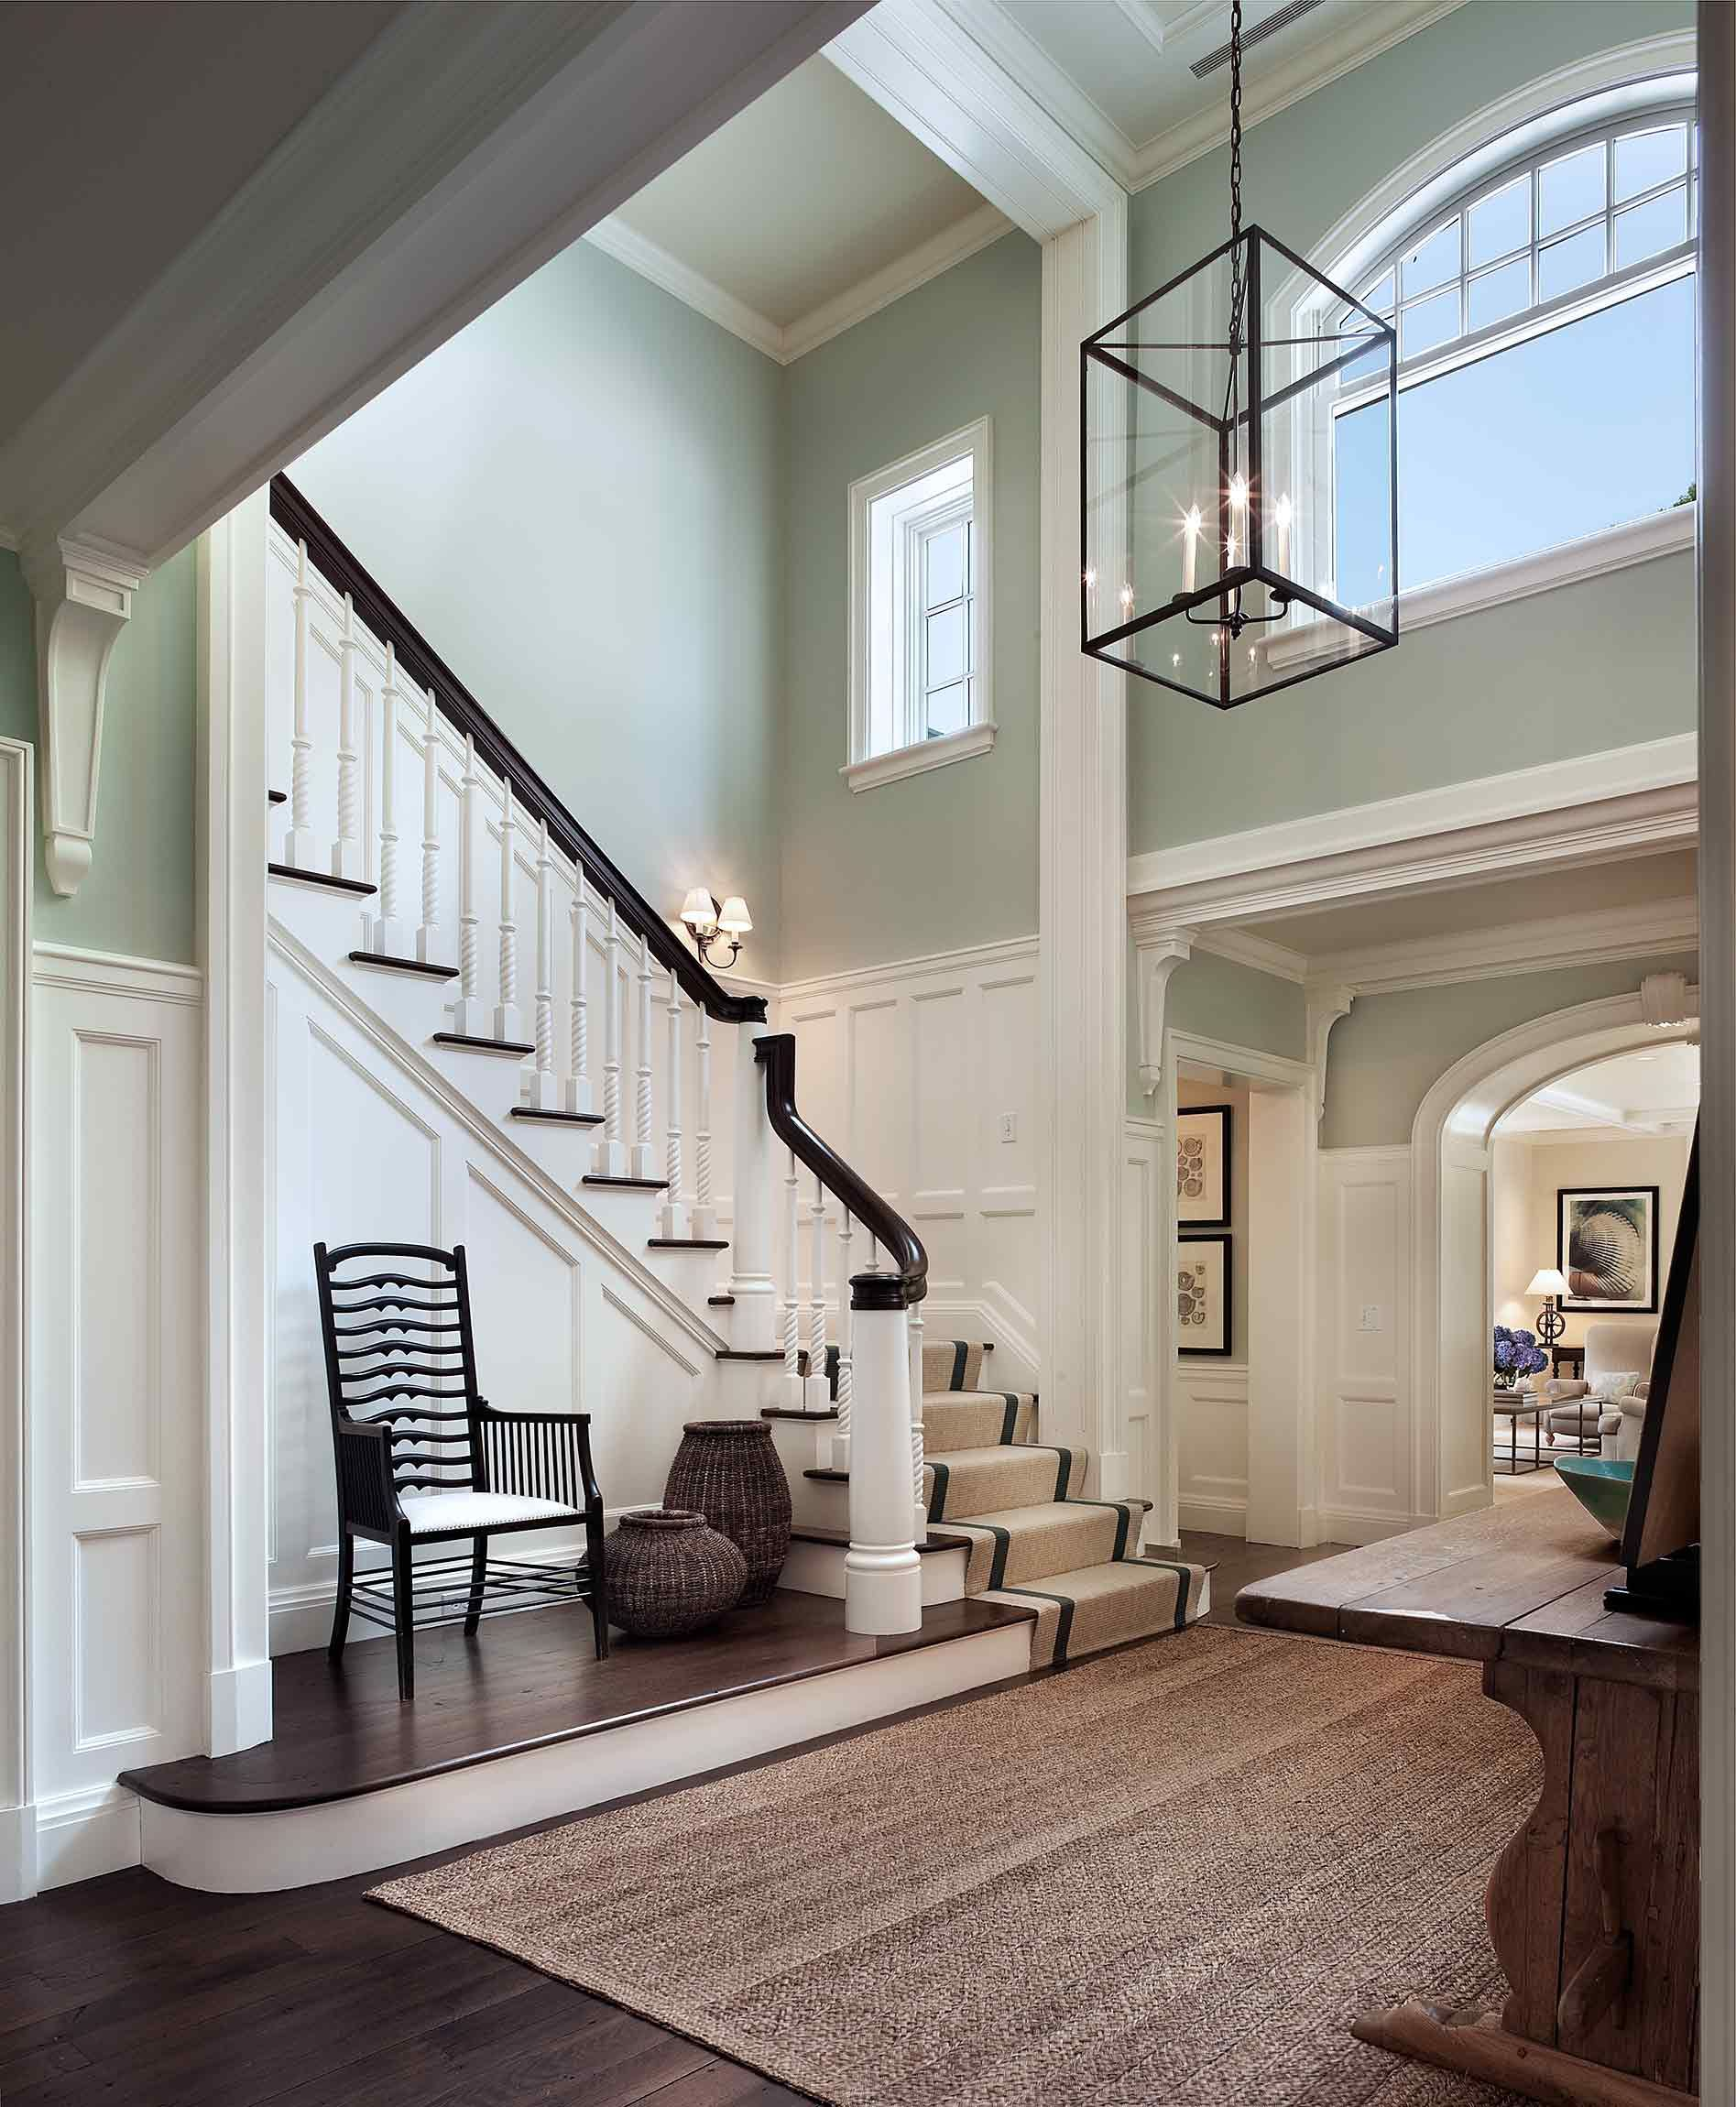 John B. Murray Architect: Details